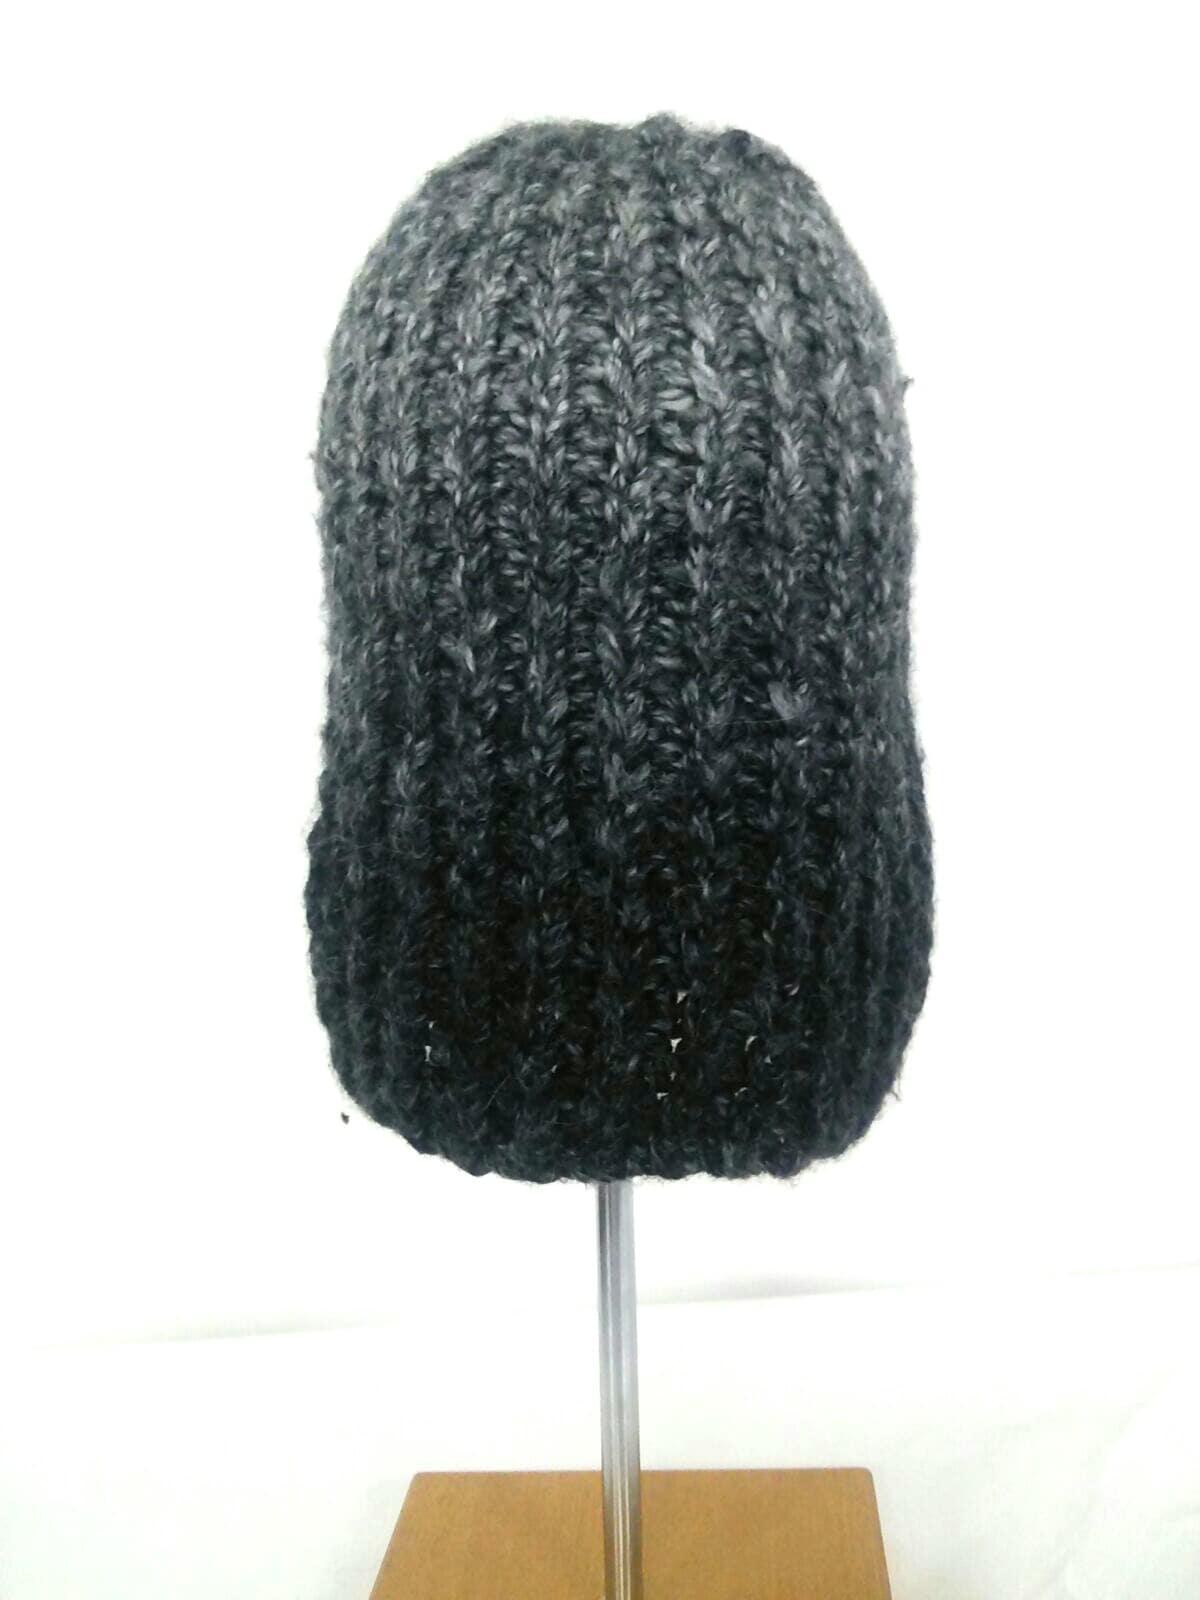 ALEXANDER WANG(アレキサンダーワン)の帽子